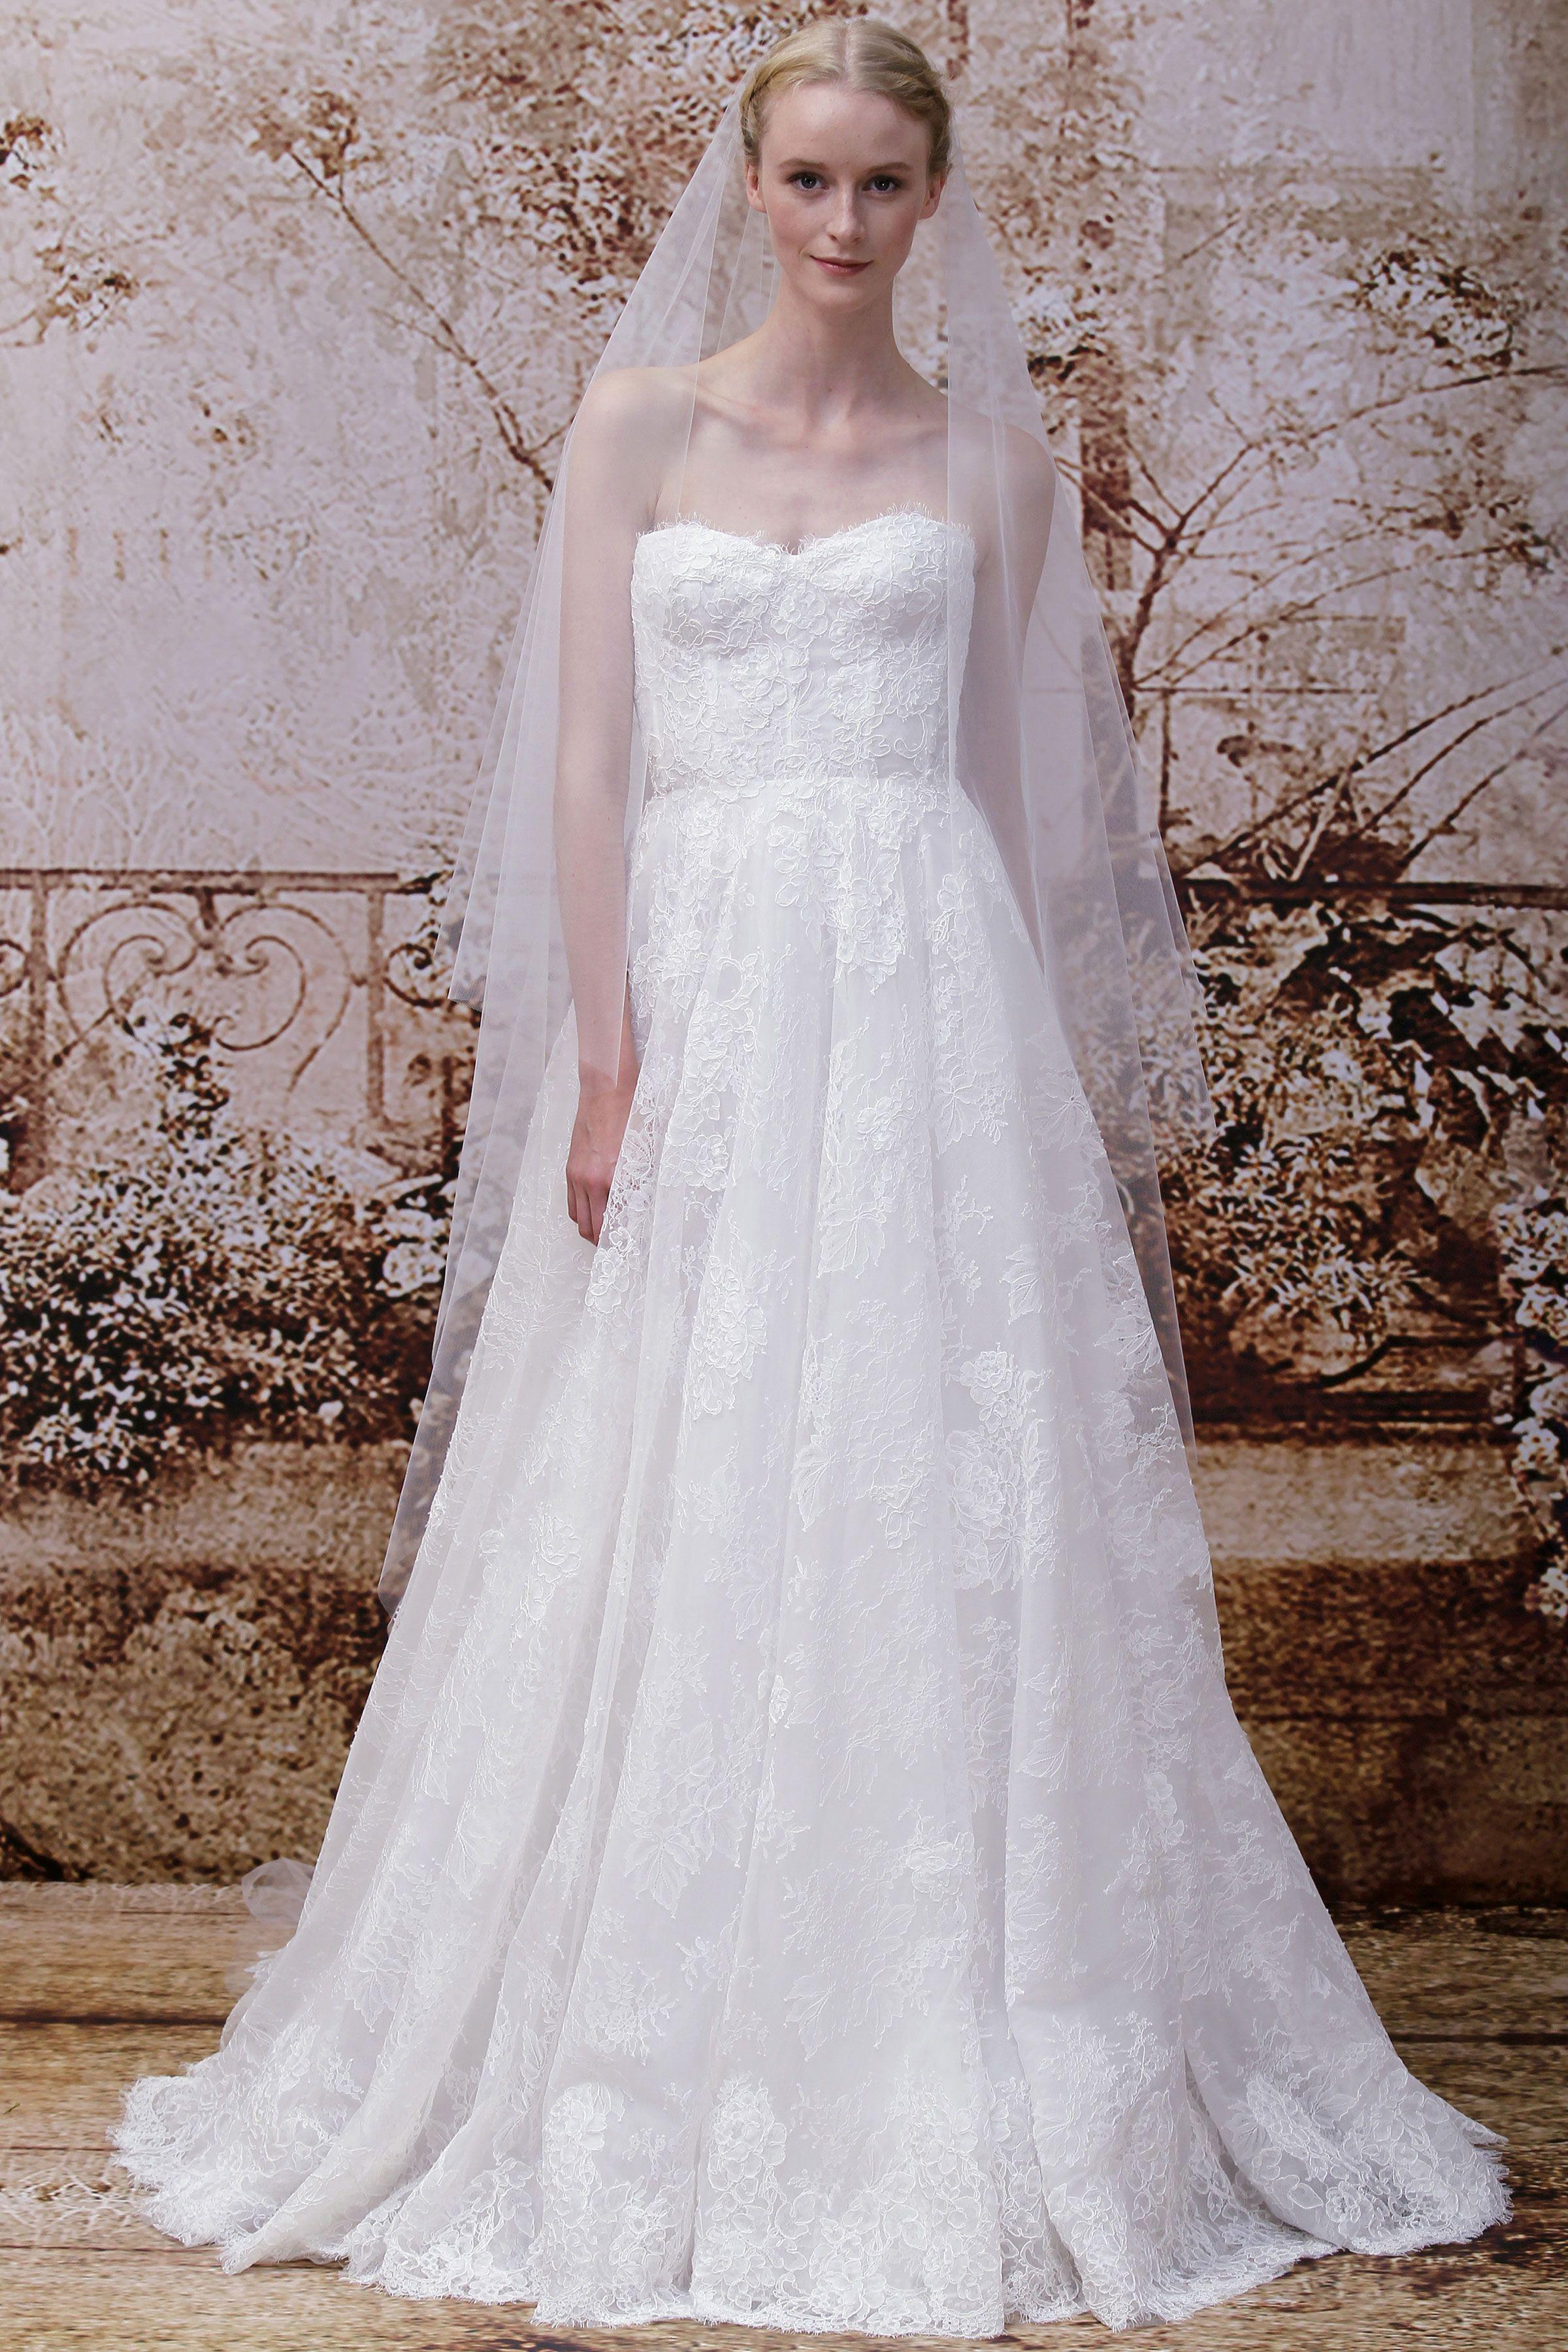 37 designer wedding dresses for fall 2014 couture wedding dress 37 designer wedding dresses for fall 2014 couture wedding dress designers junglespirit Gallery